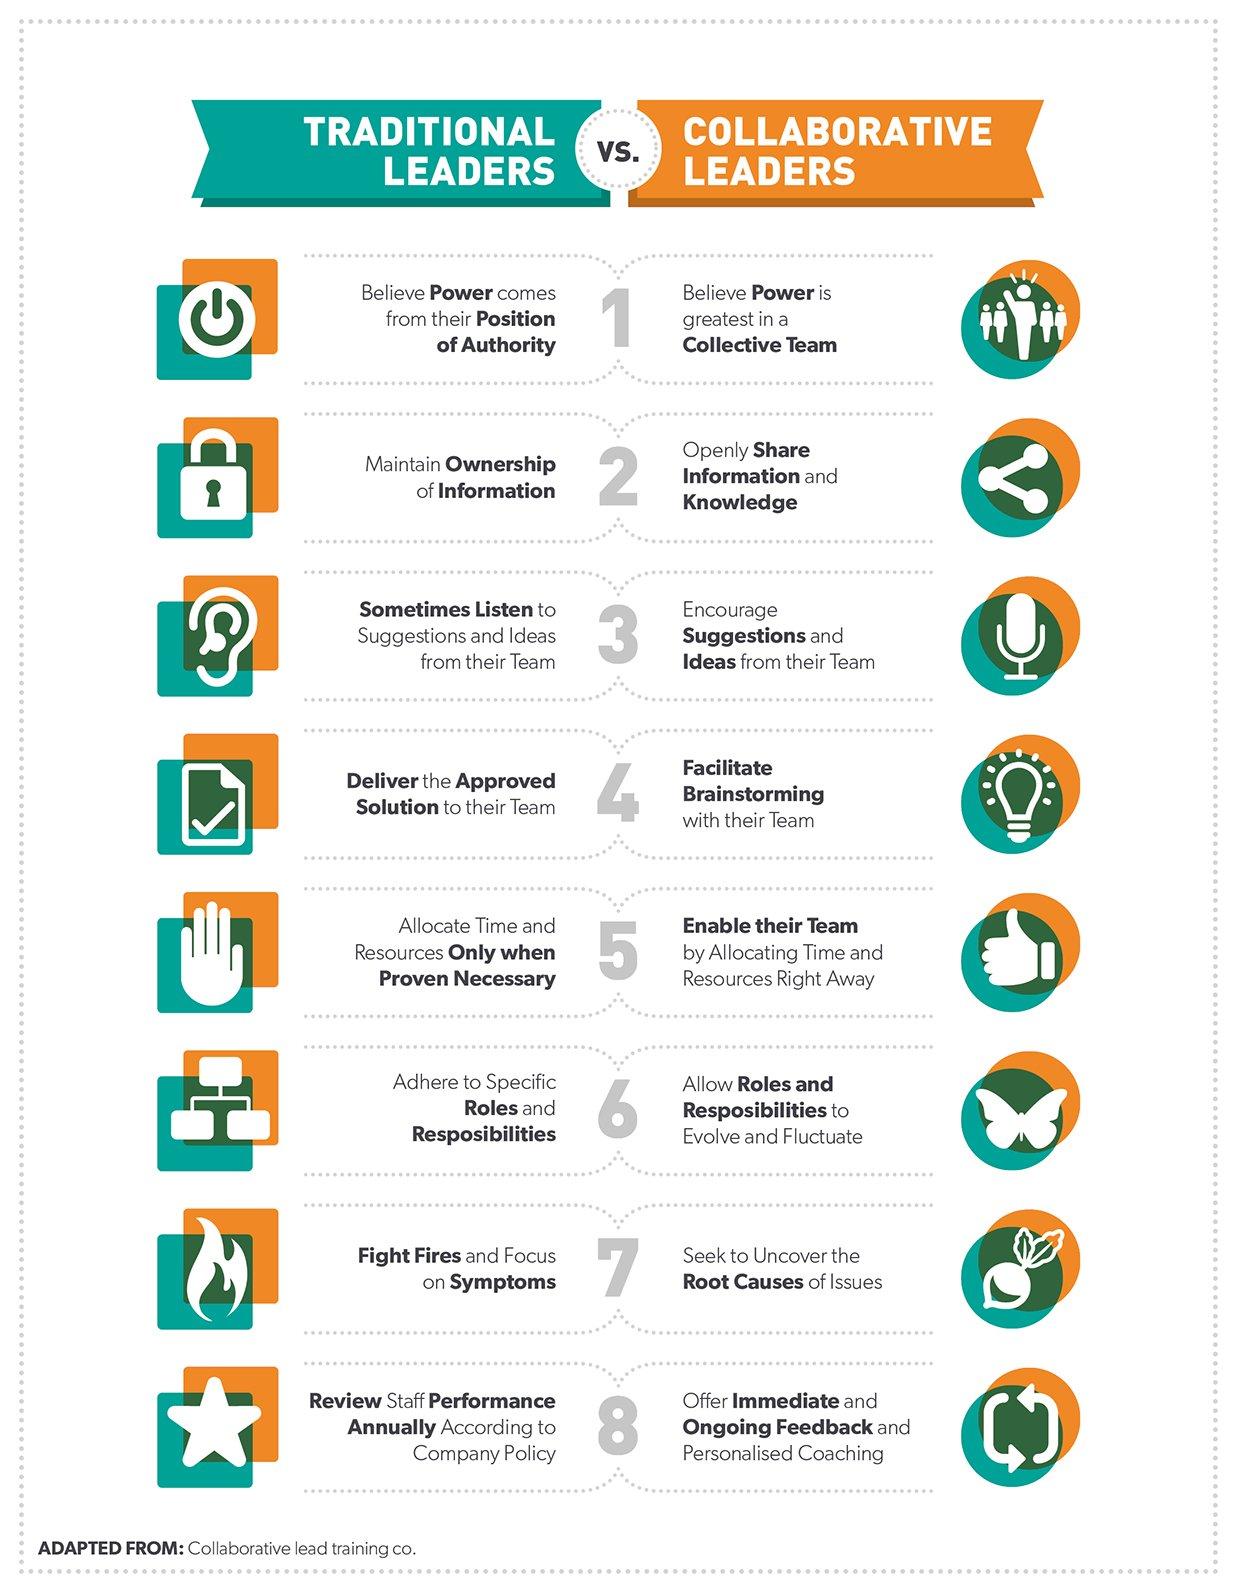 traditionnal leaders vs collaborative leaders